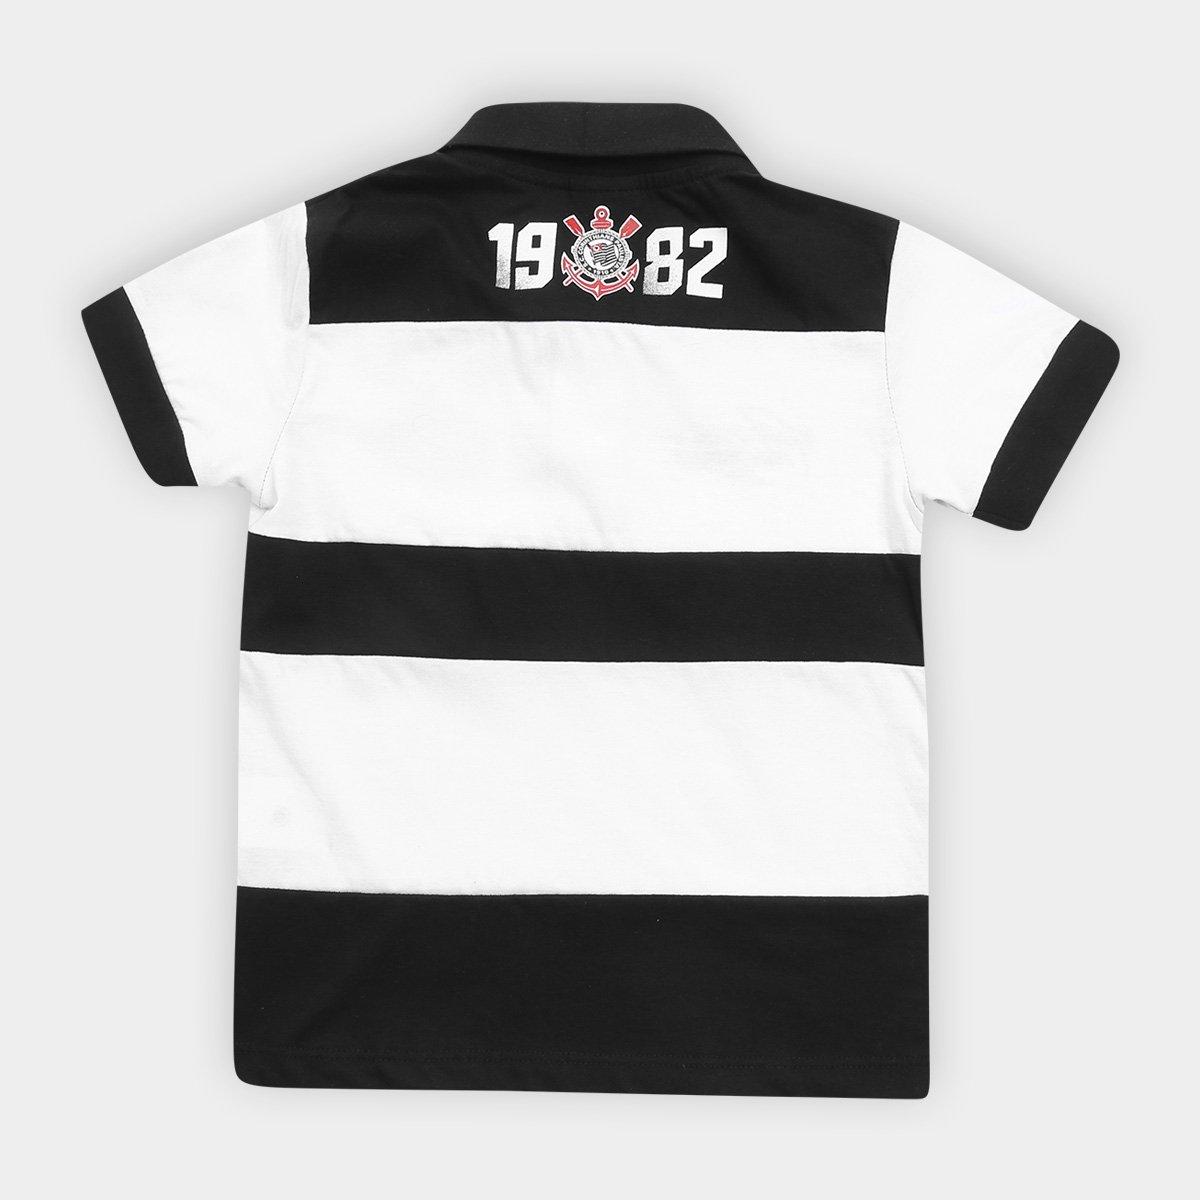 Camisa Polo Infantil Corinthians Democracia 1982 - Preto e Branco ... e59c547231b09